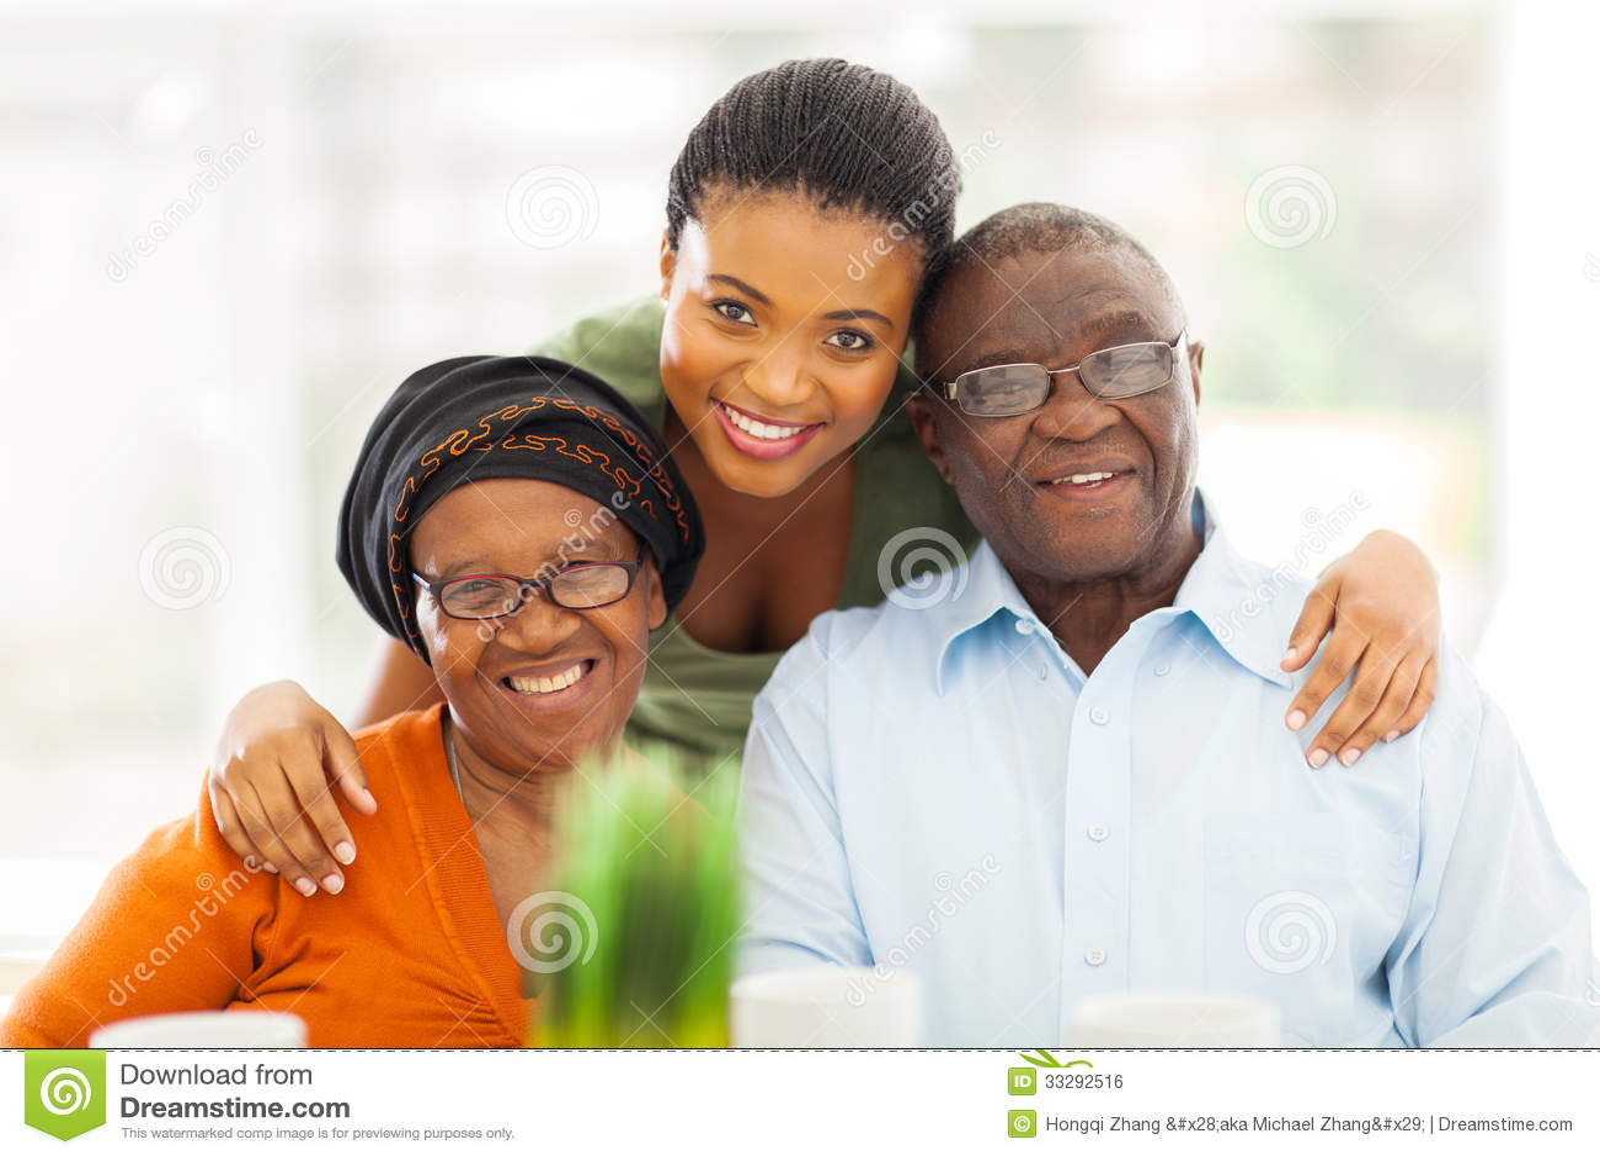 famille africaine heureuse image libre de droits image 33292516. Black Bedroom Furniture Sets. Home Design Ideas